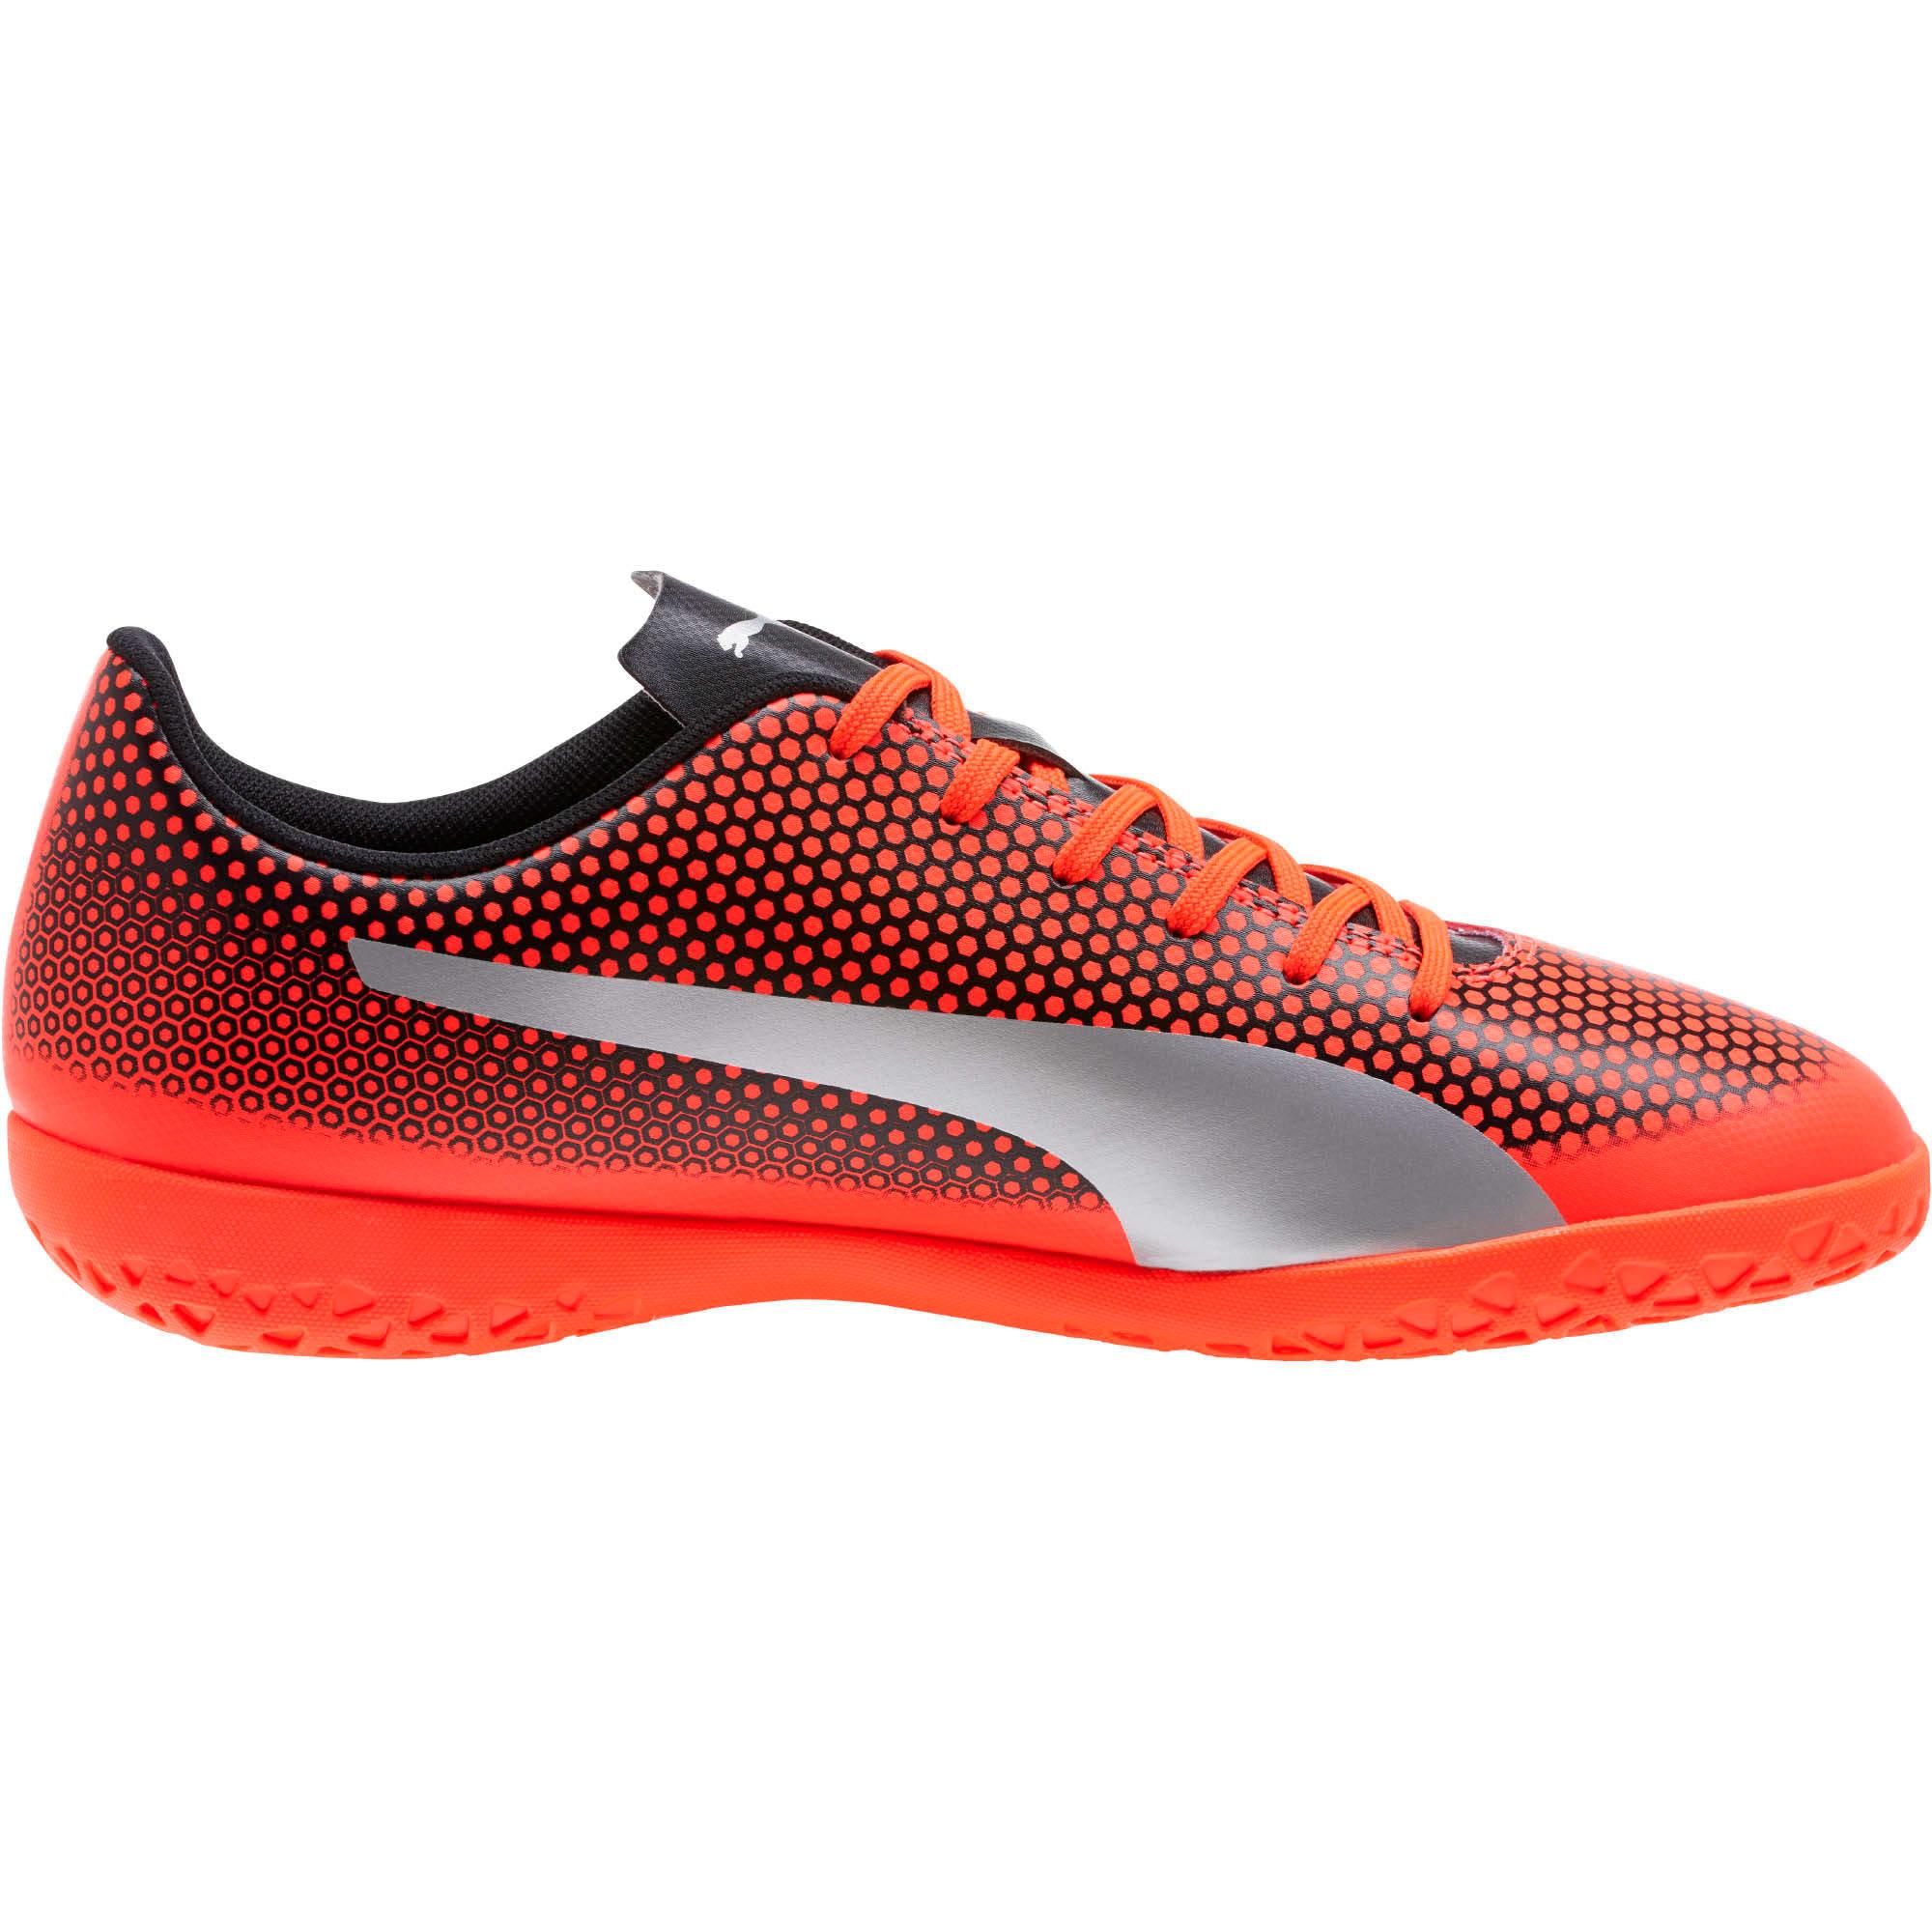 Thumbnail 3 of PUMA Spirit IT Men's Soccer Shoes, Red-Silver-Black, medium